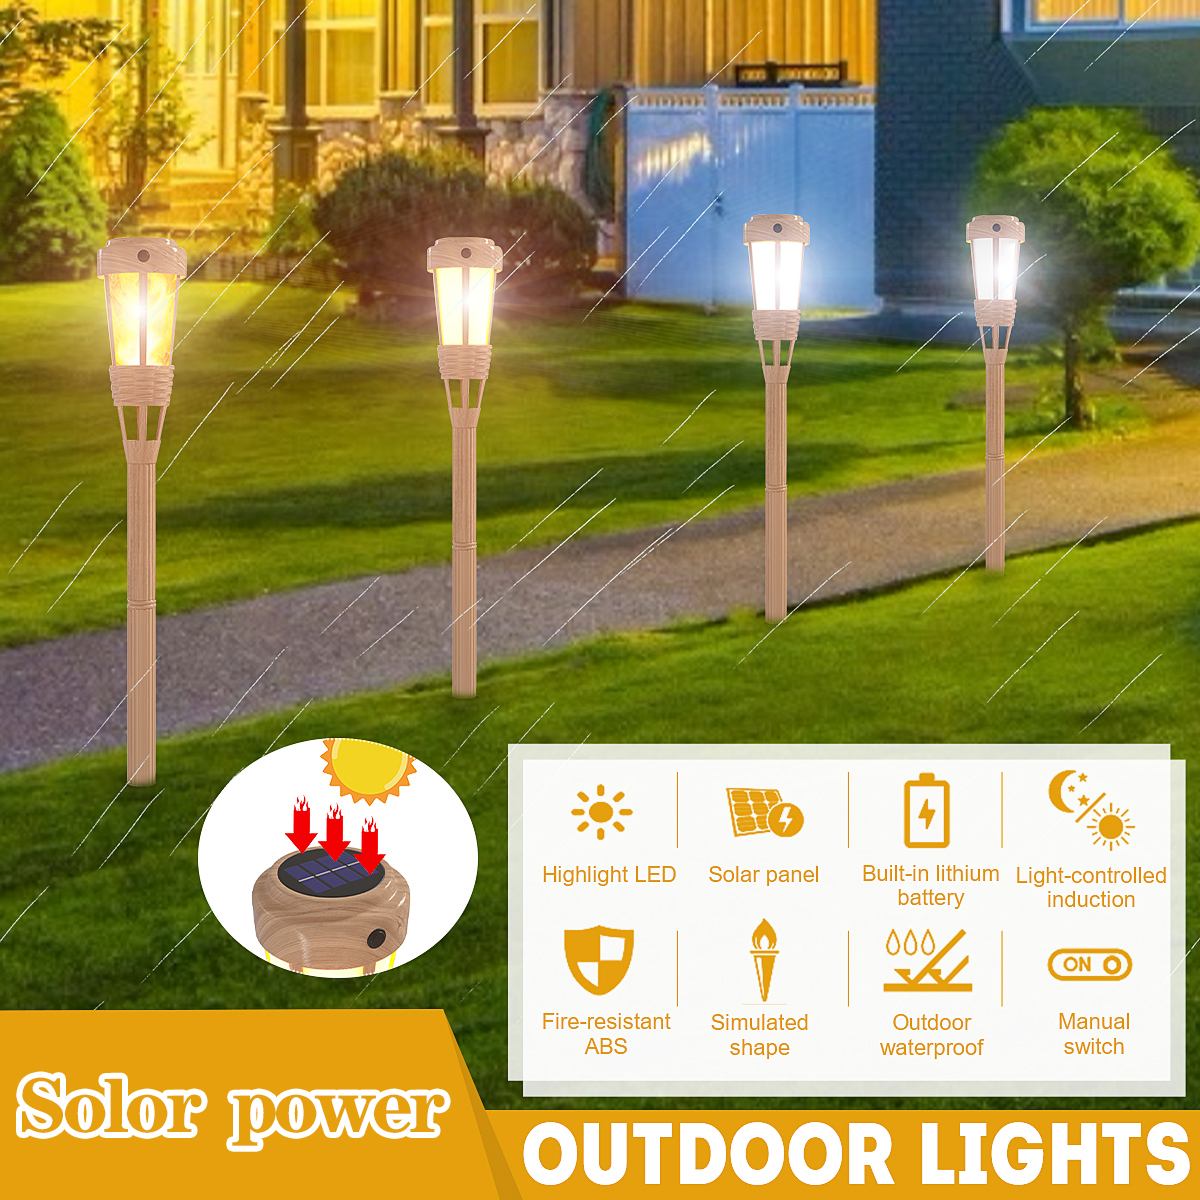 Solar Powered Lawn Light Garden Decoration Light Outdoor Waterproof Flame Lamps